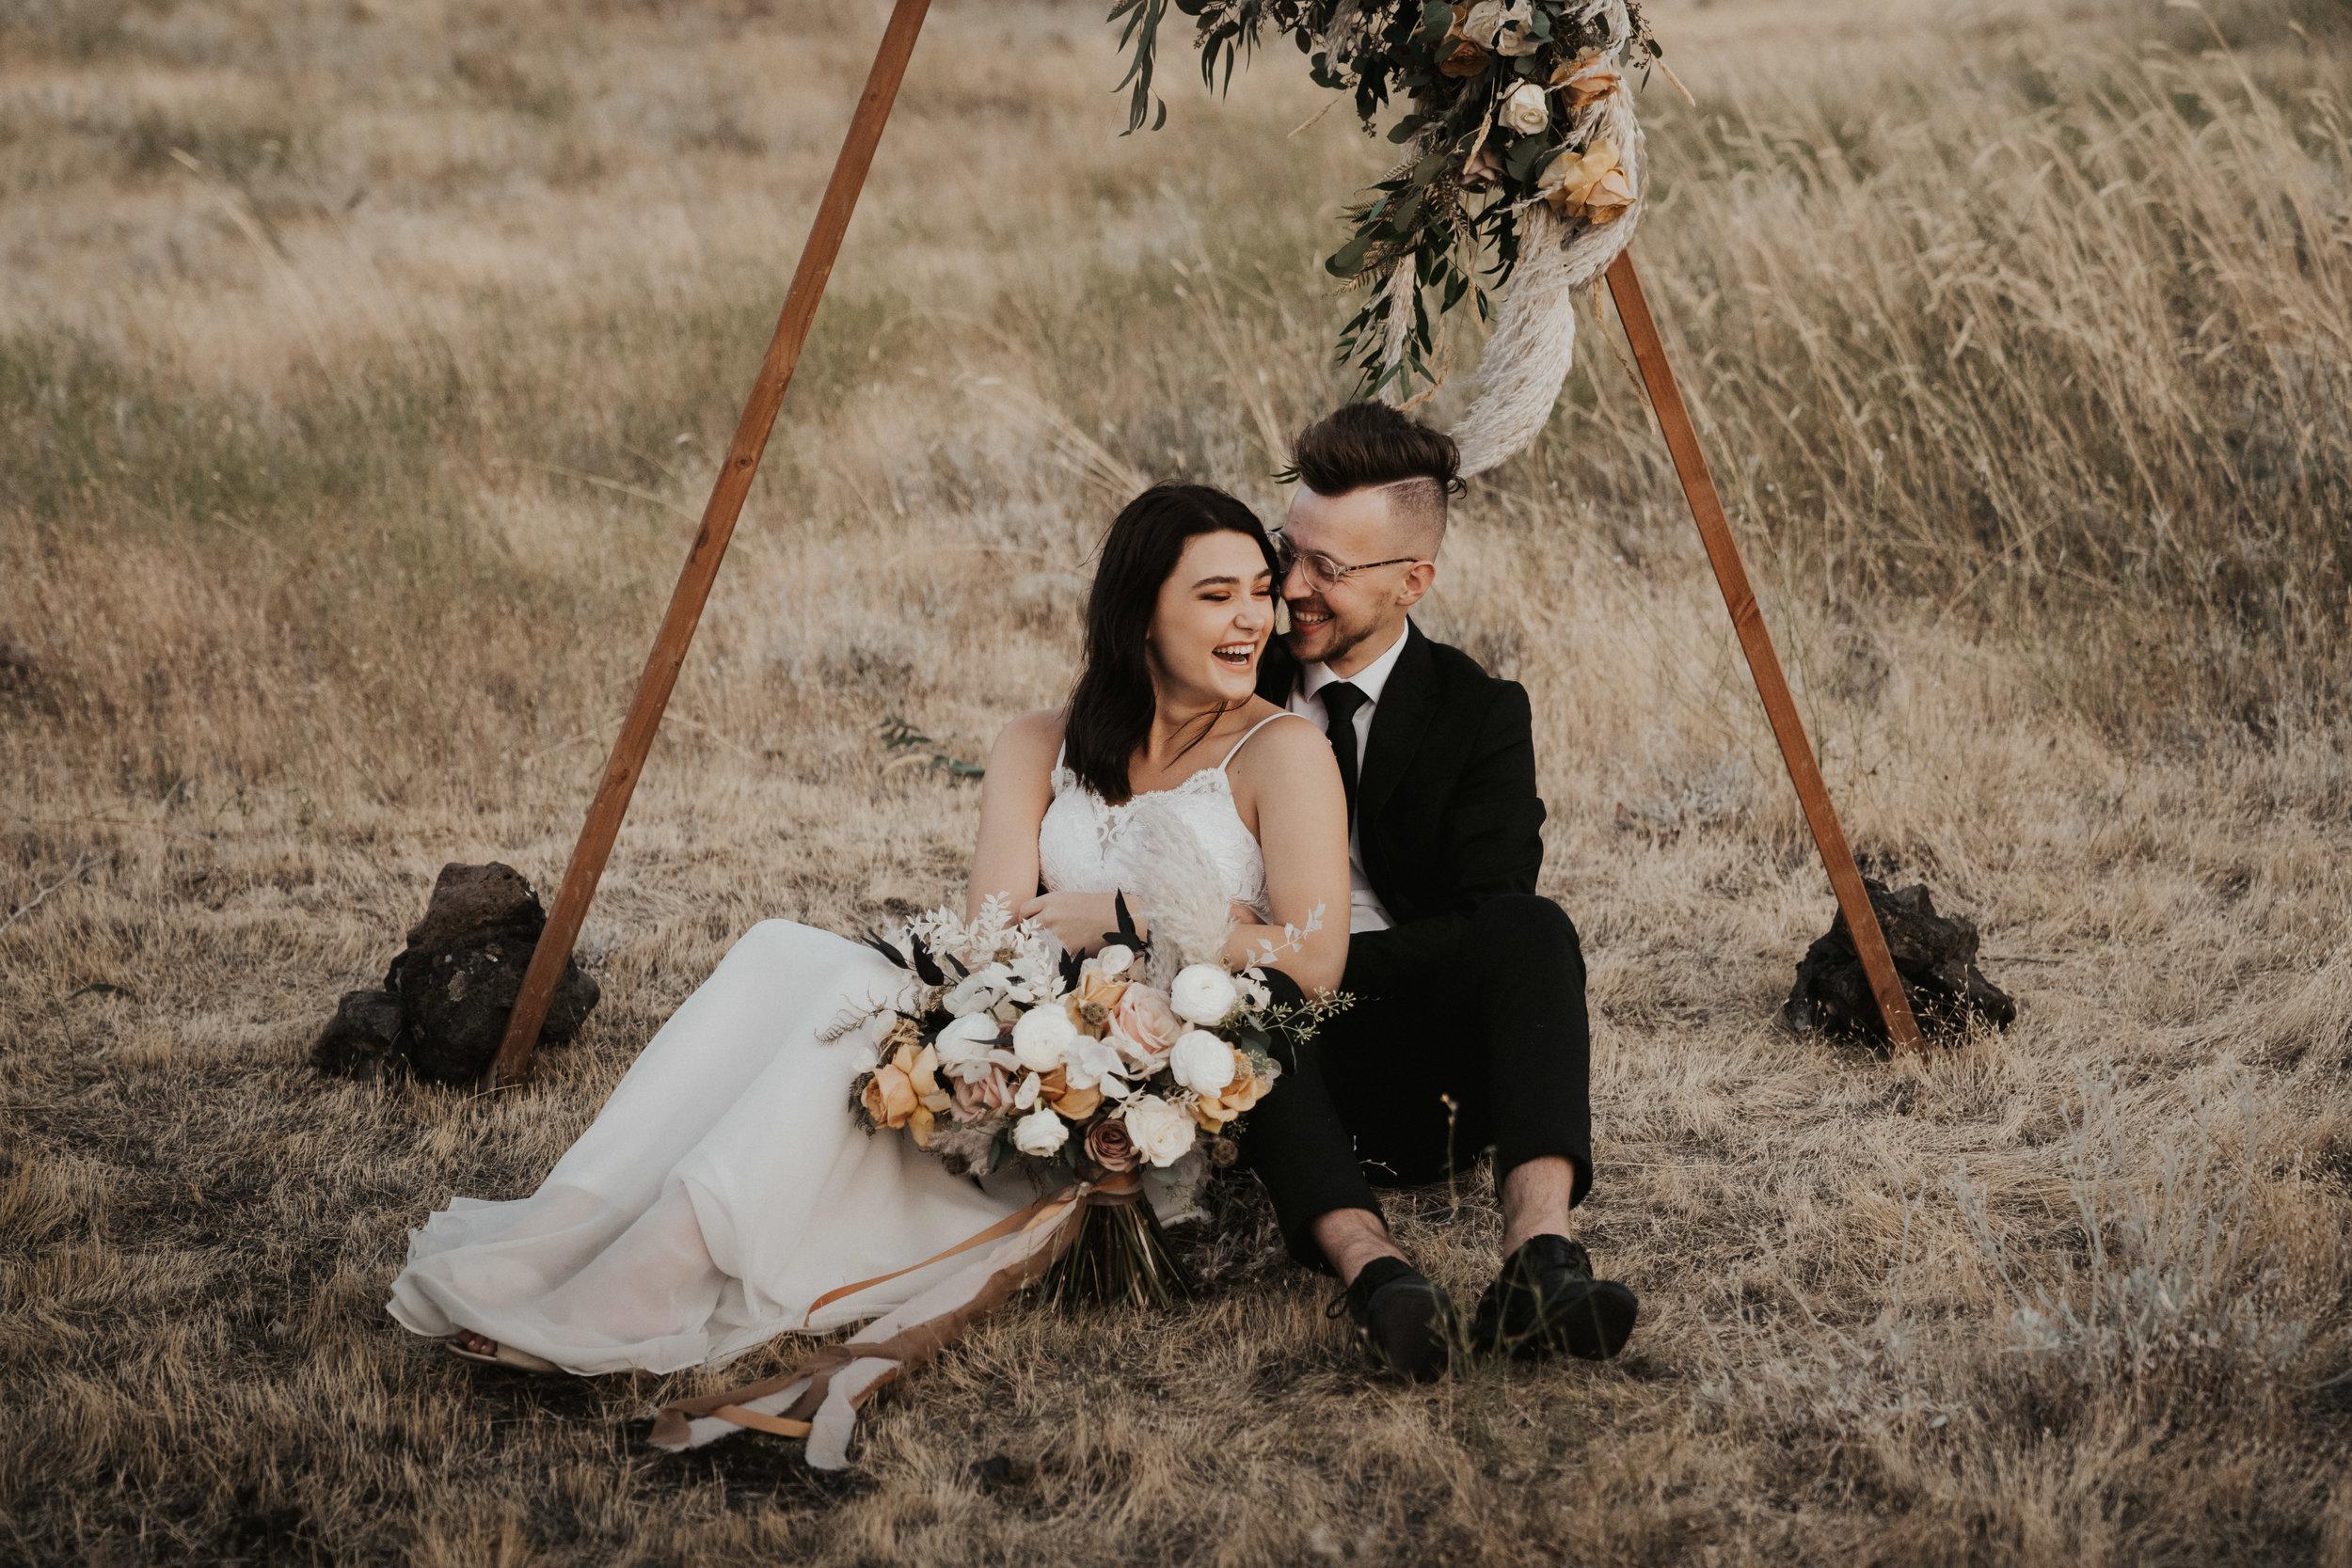 columbia-river-gorge-wedding-elopement-inspiration-28.jpg